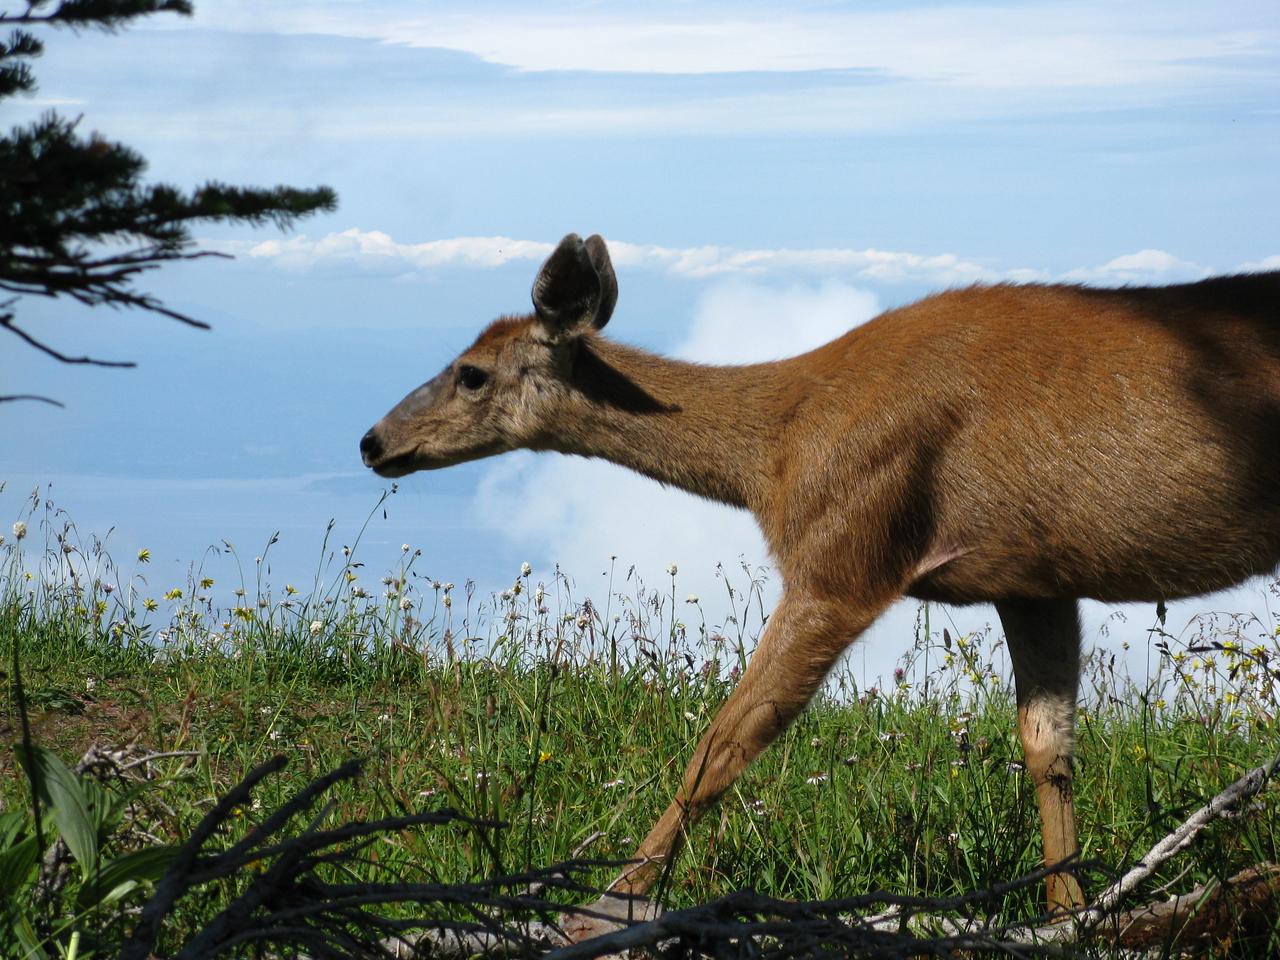 The doe at the ridge line.